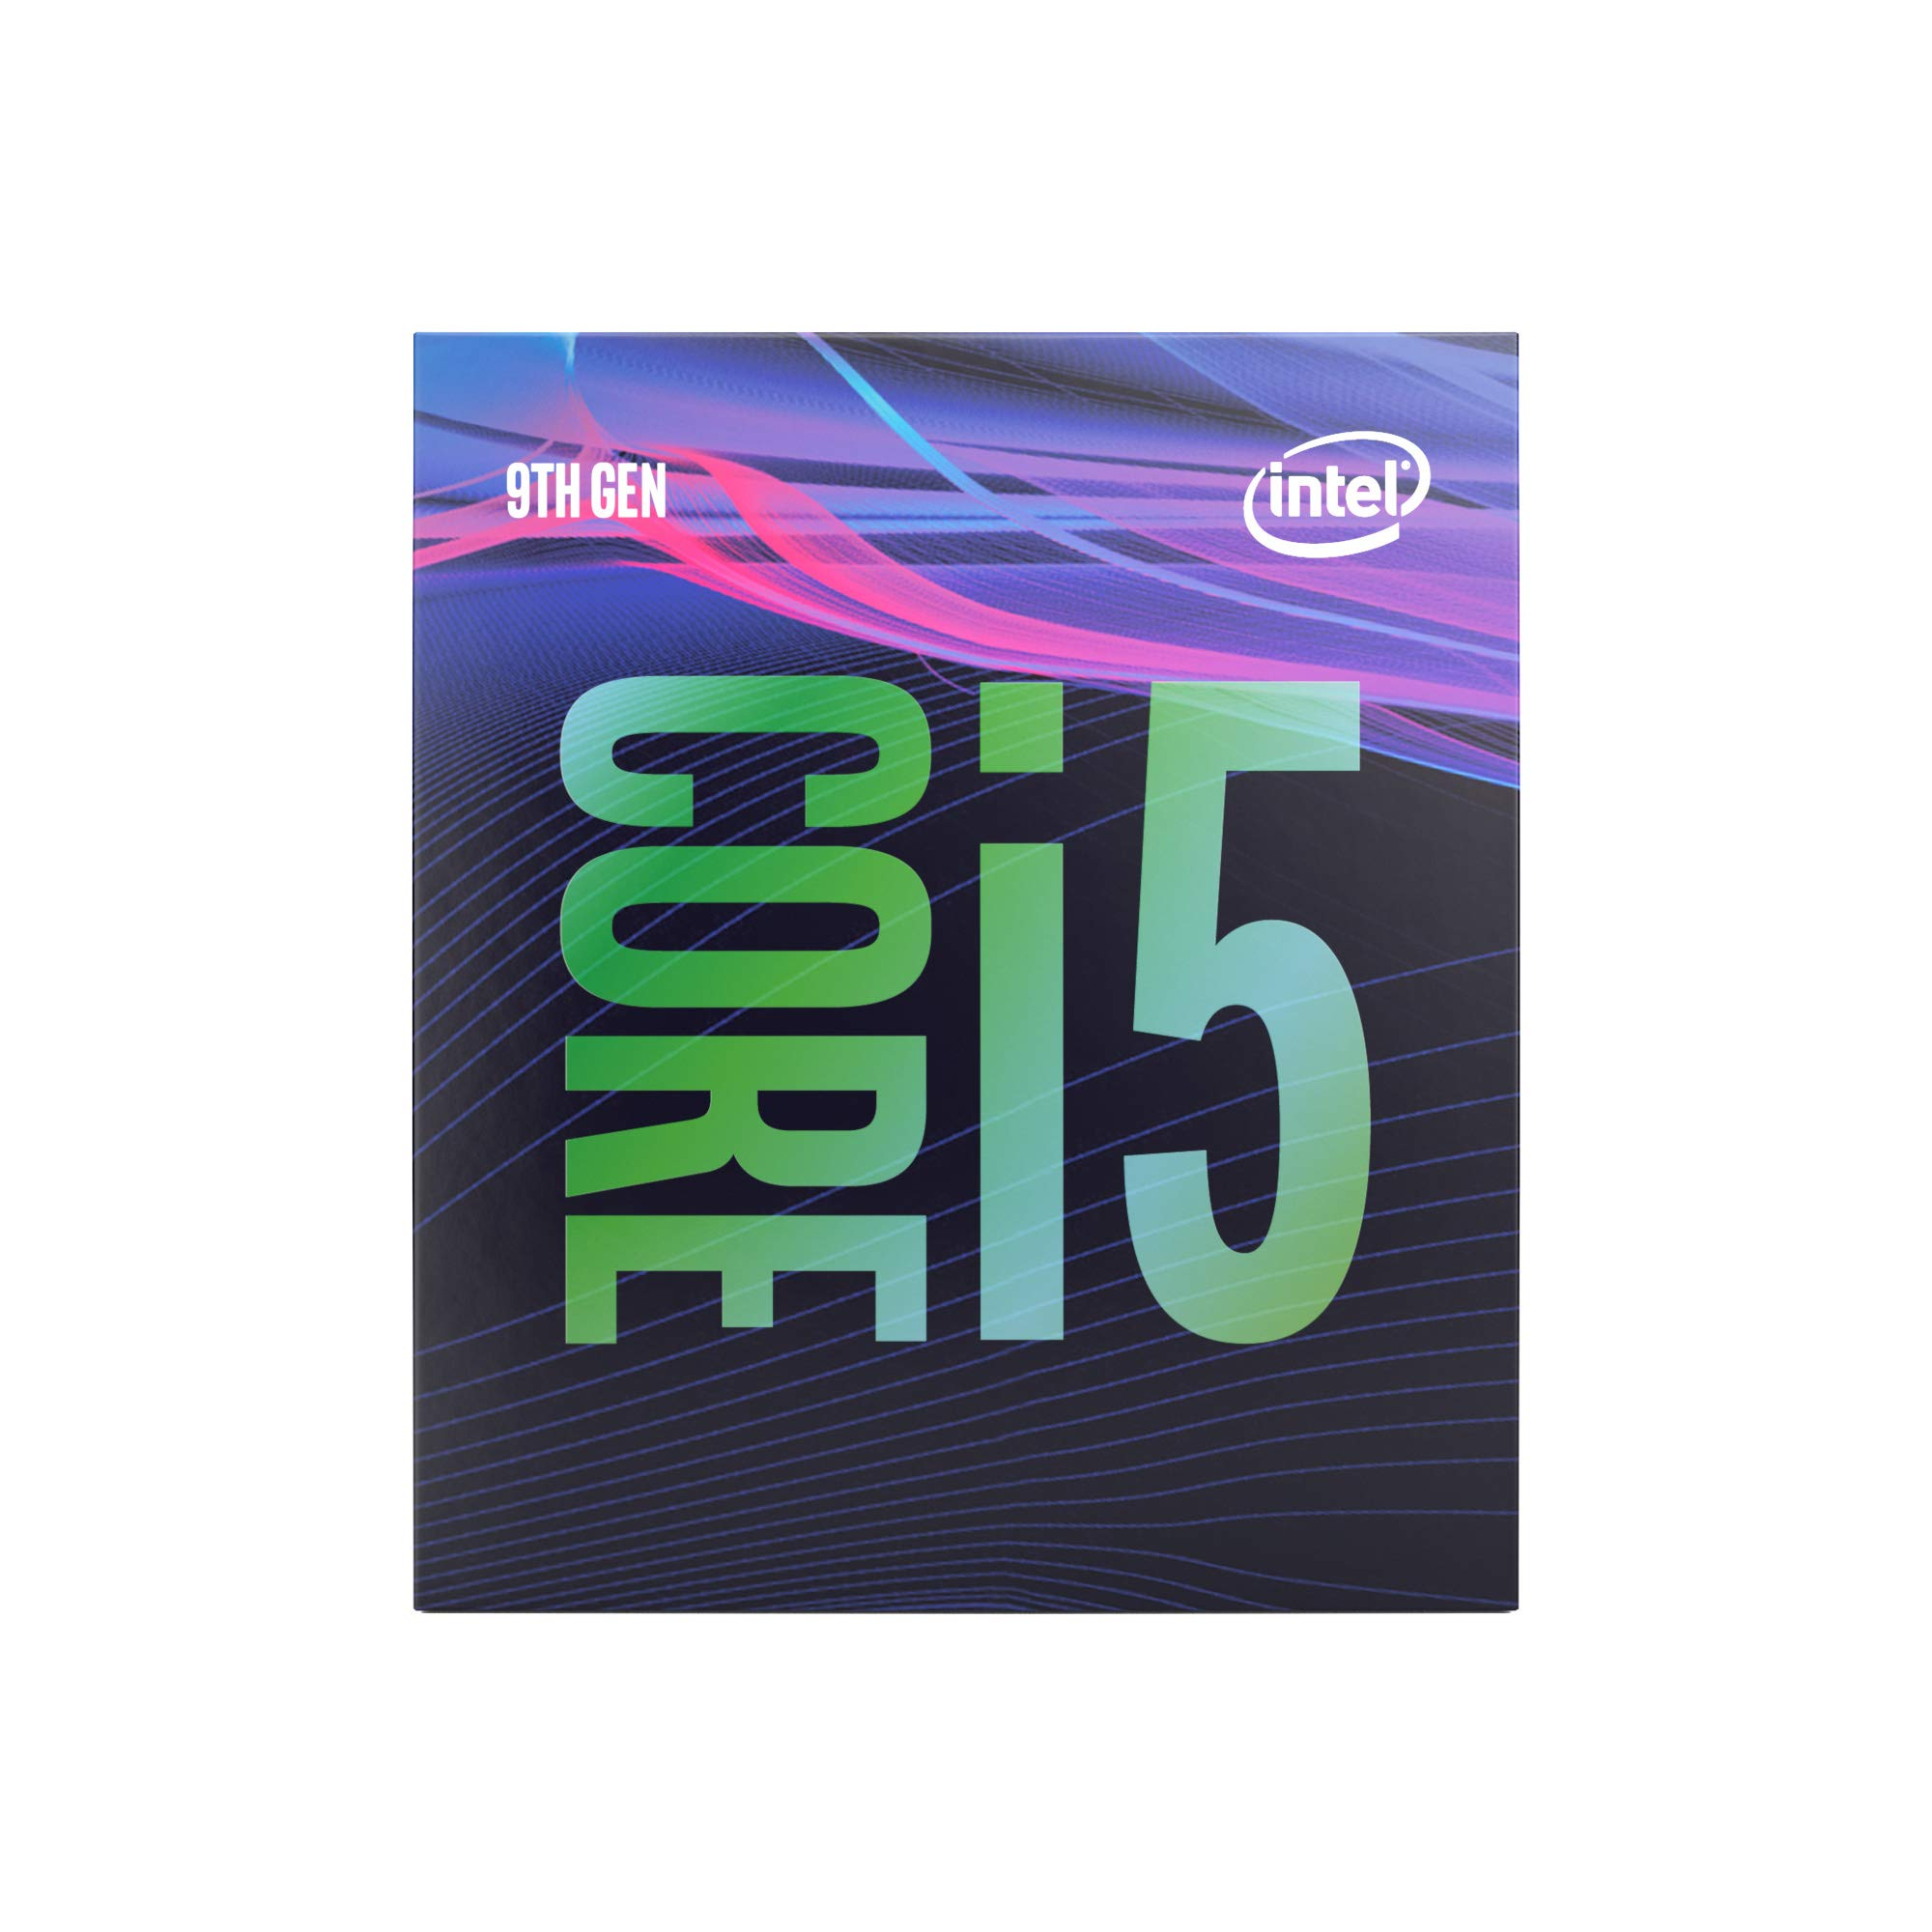 Intel Core i5-9400 Desktop Processor 6 Cores up to 4.1 GHz Turbo LGA1151 300 Series 65W Processors 984507 by Intel